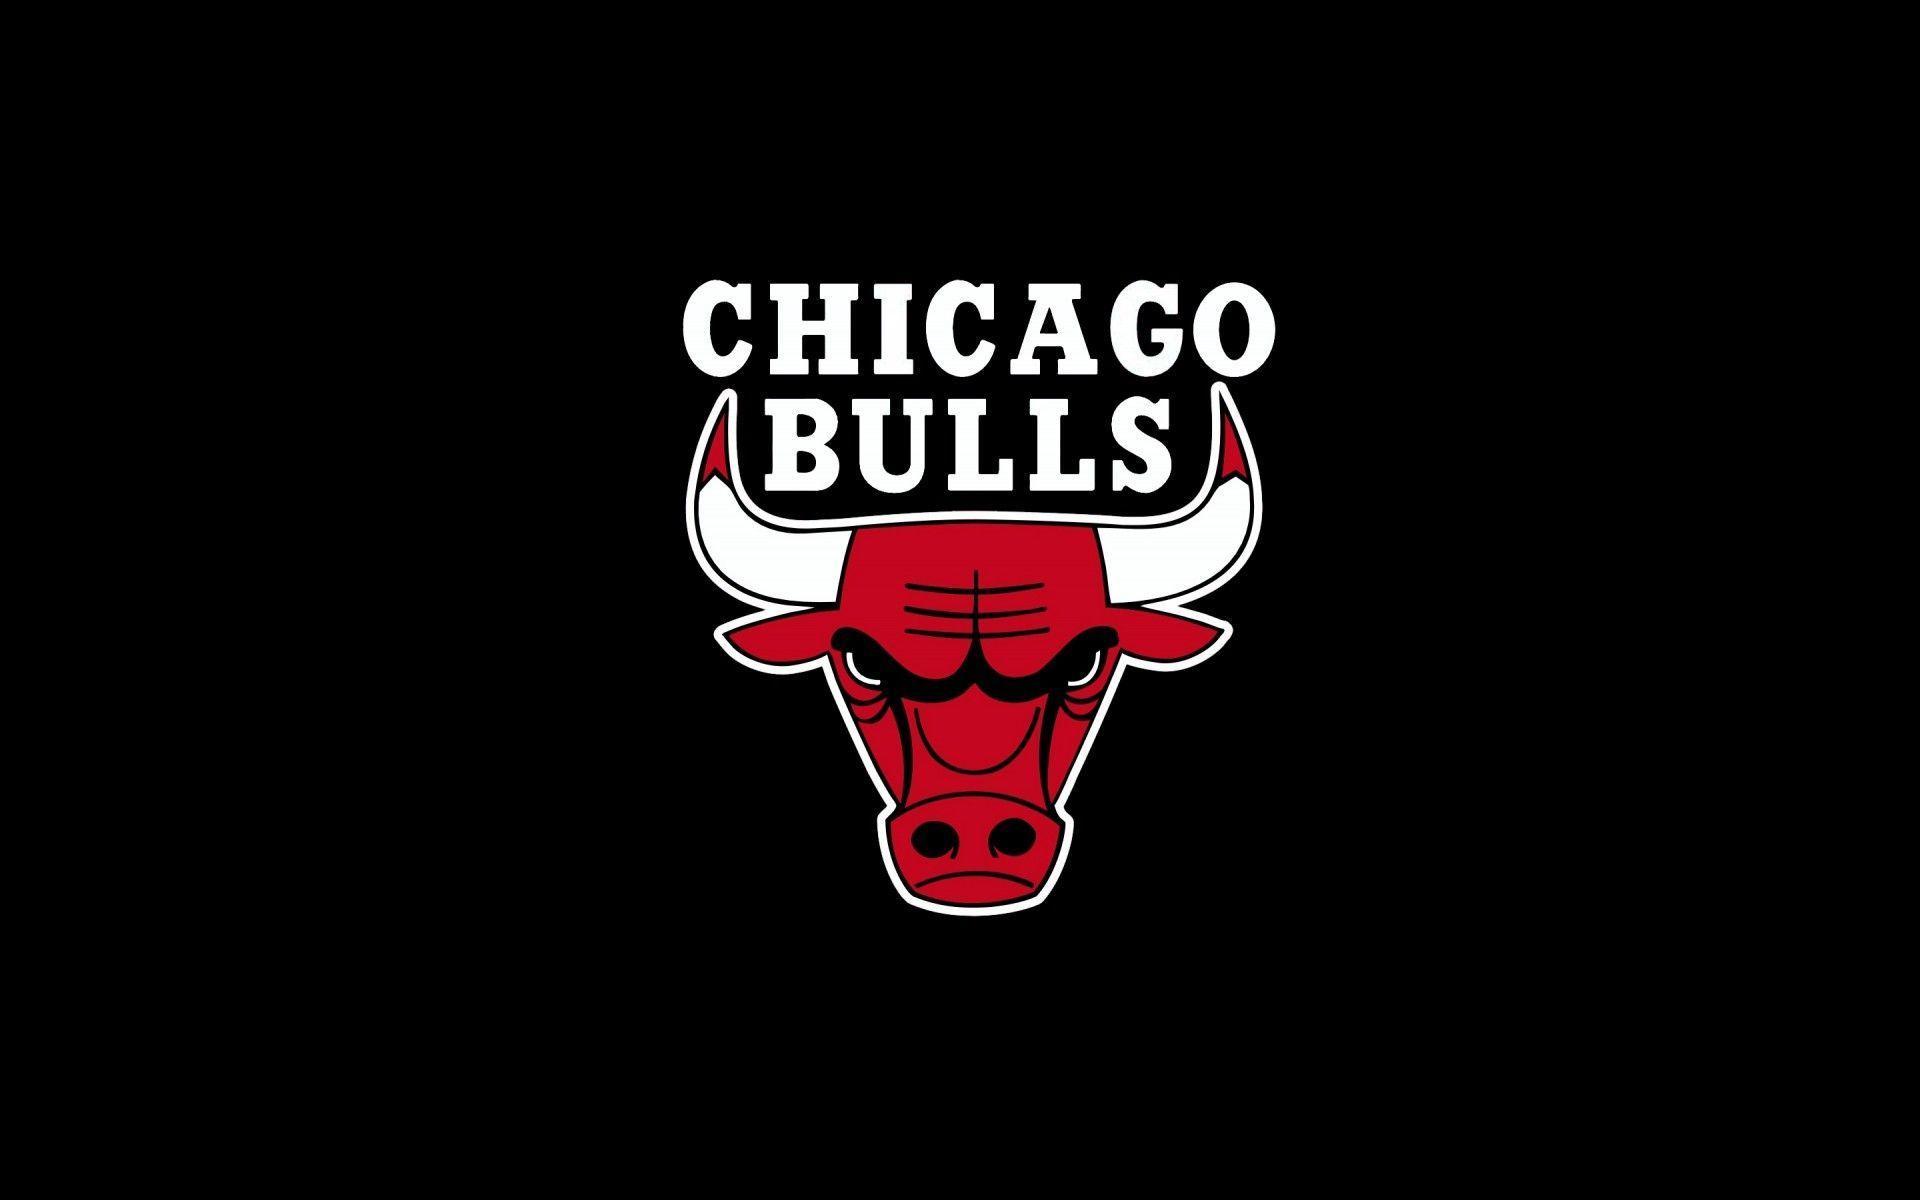 chicago bulls wallpapers hd - wallpaper cave